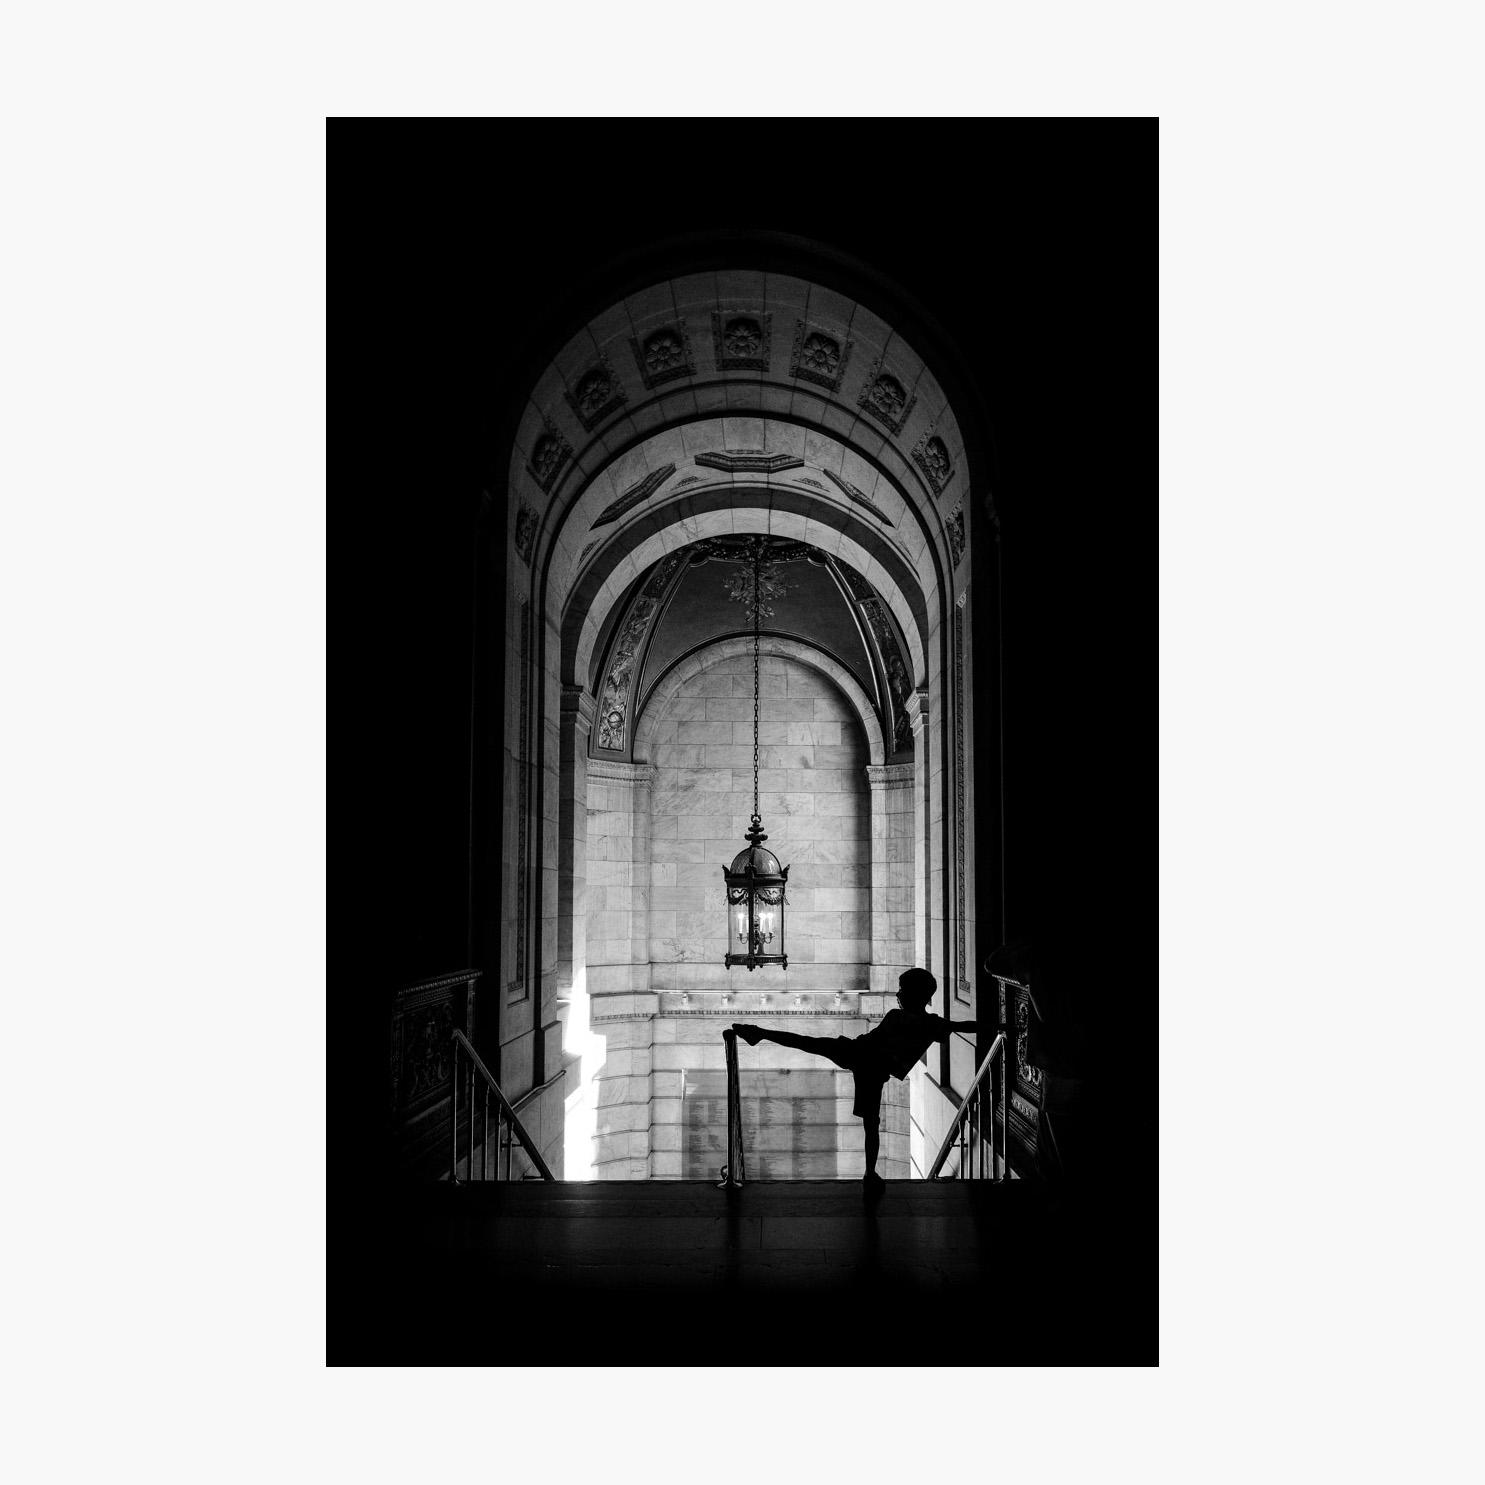 ©-2018-Harry-W-Edmonds-London-Photographer-Photographers-Note-Making-the-Shot-PN04.jpg